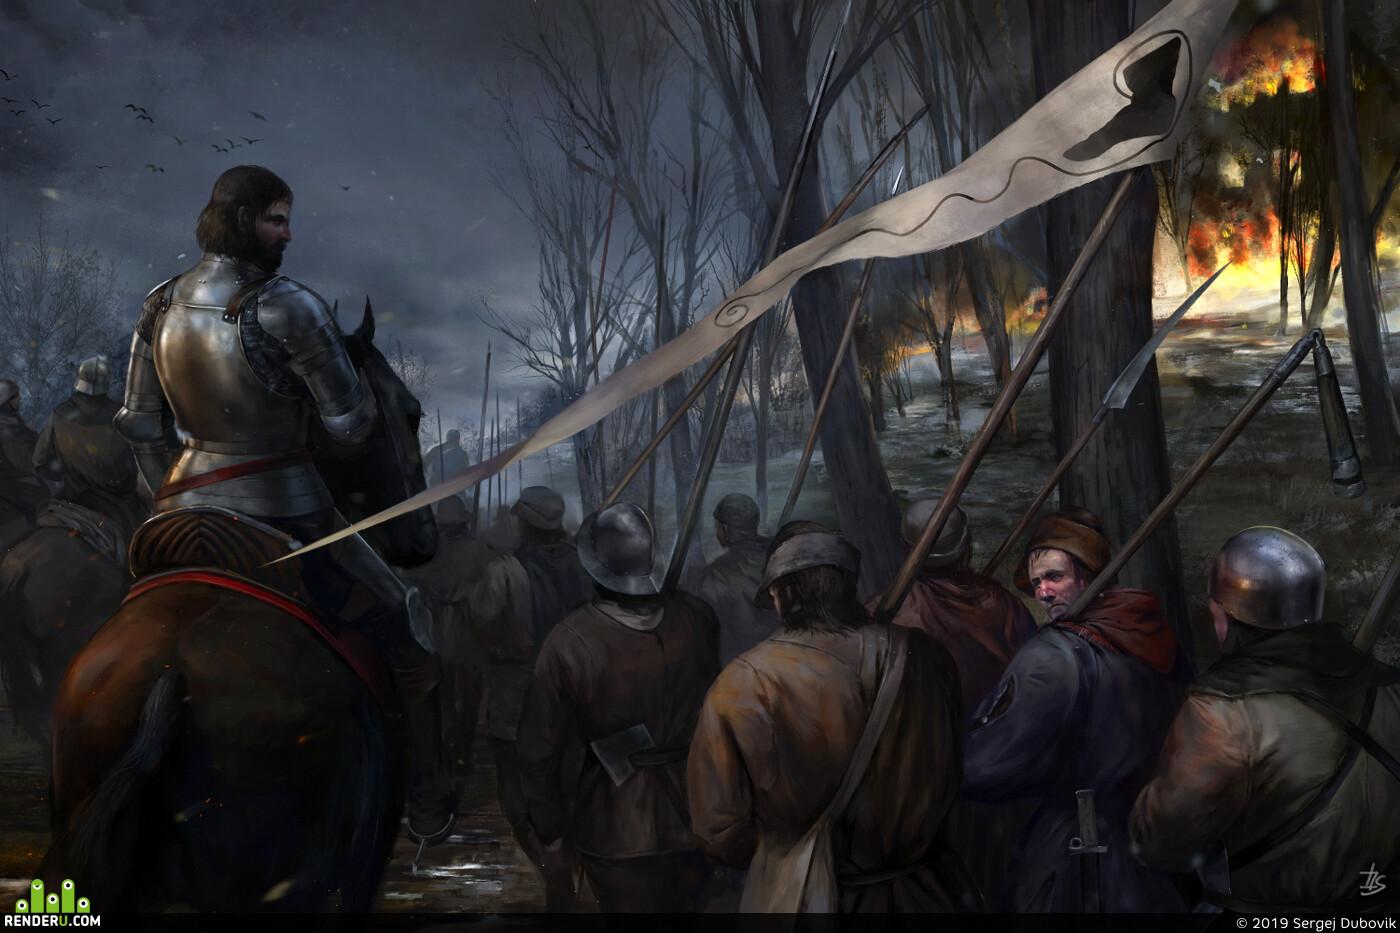 История, восстание, союз башмака